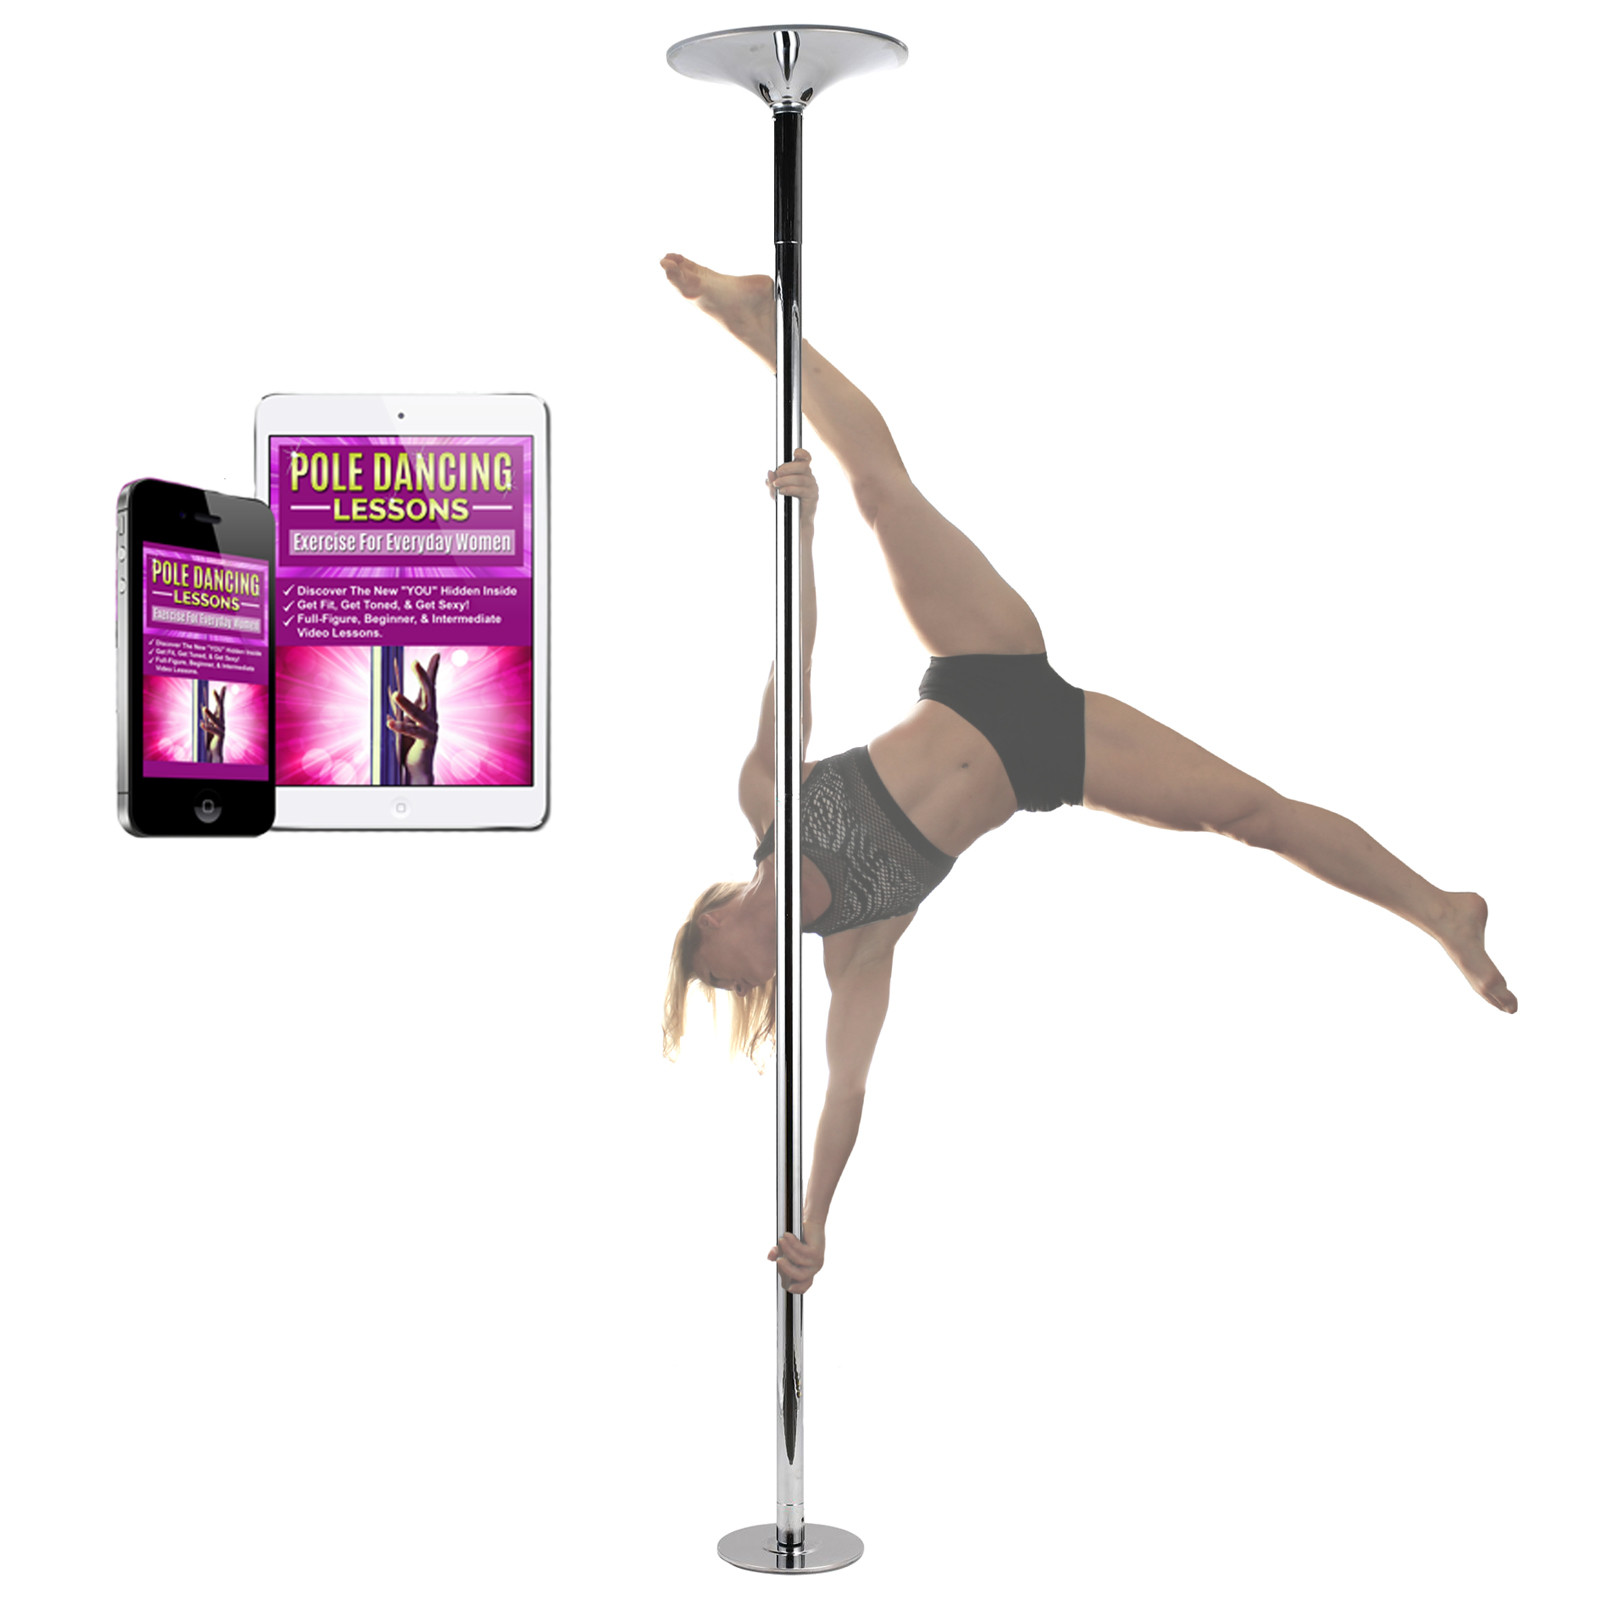 Pole dance wear Pole dancer Yoga Pole dance set Pole Wear Pole dance Pole dance costume Fitness Pole Poledance